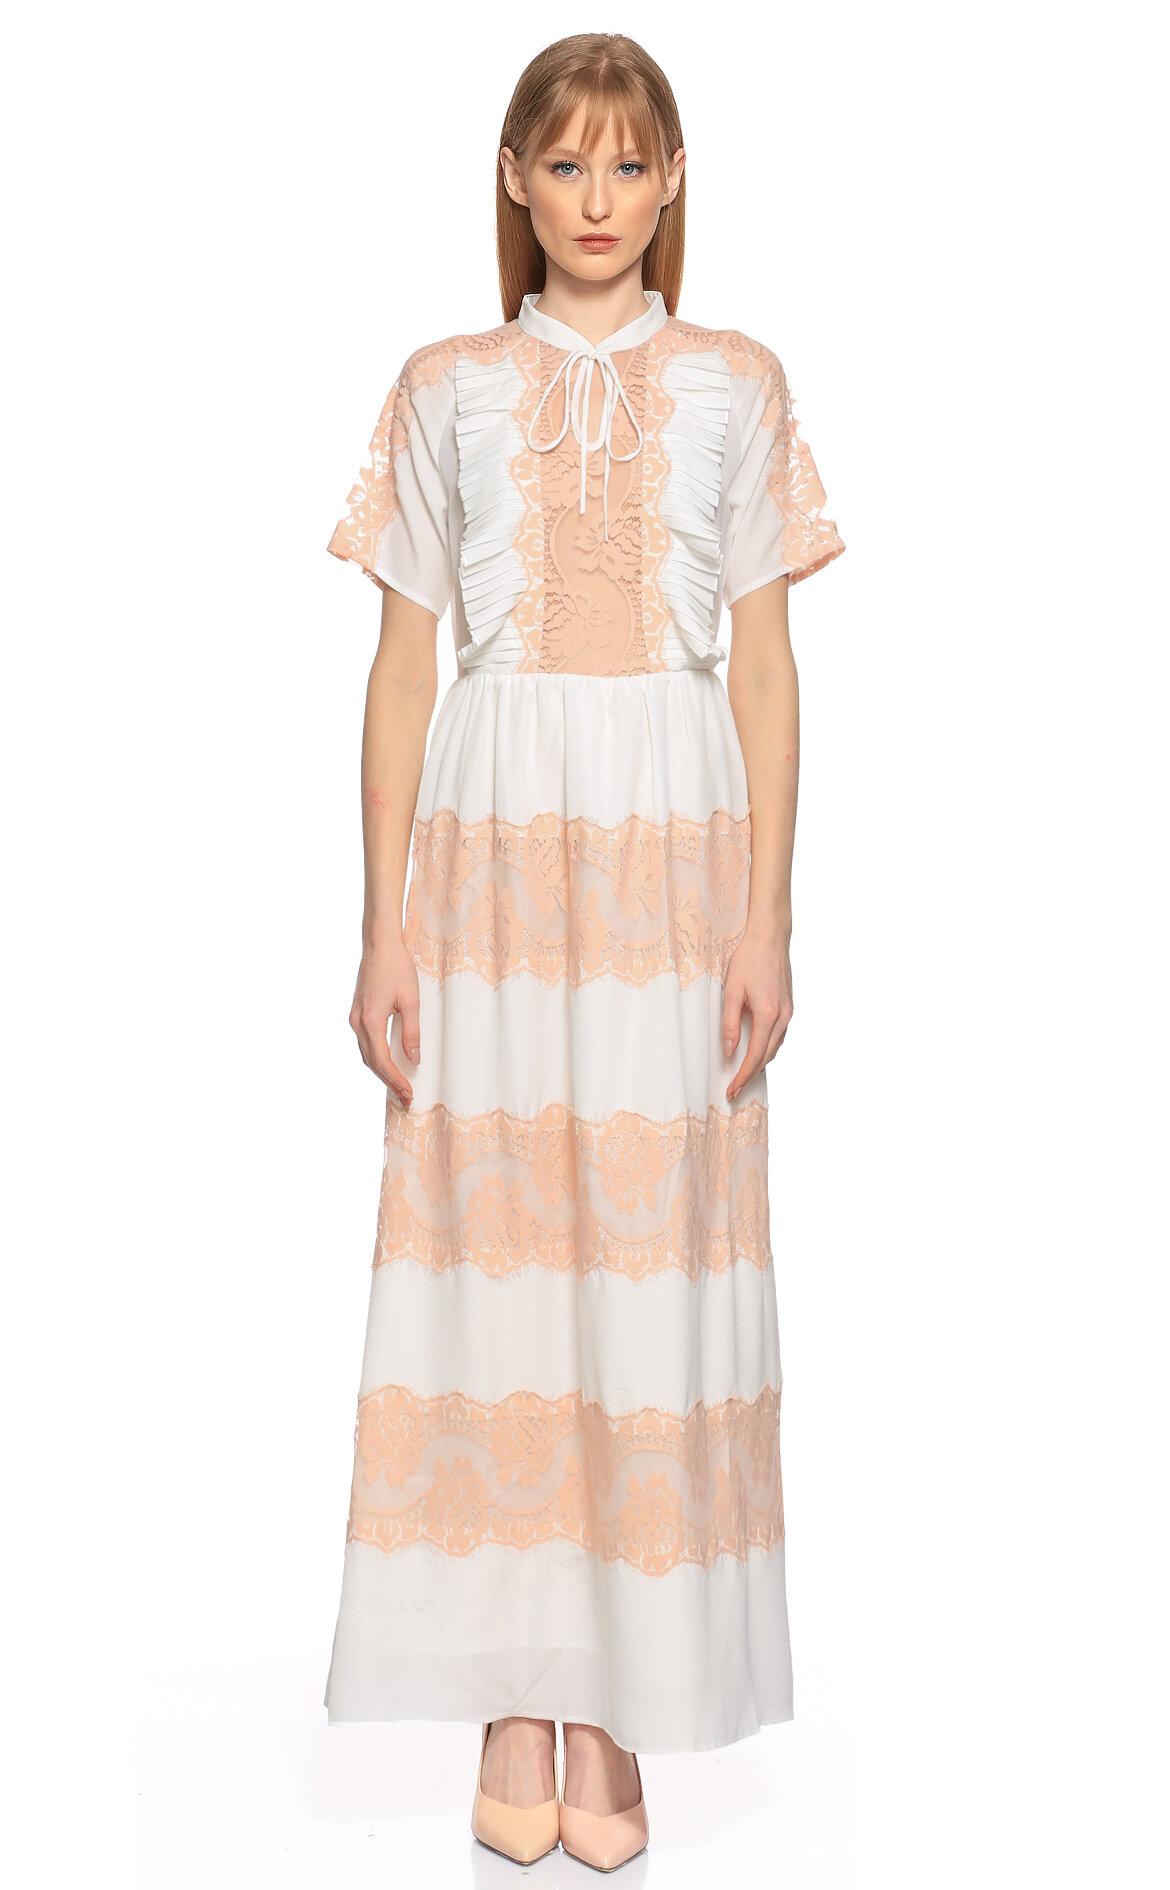 Silvian Heach-Silvian Heach Dantel Detaylı Elbise